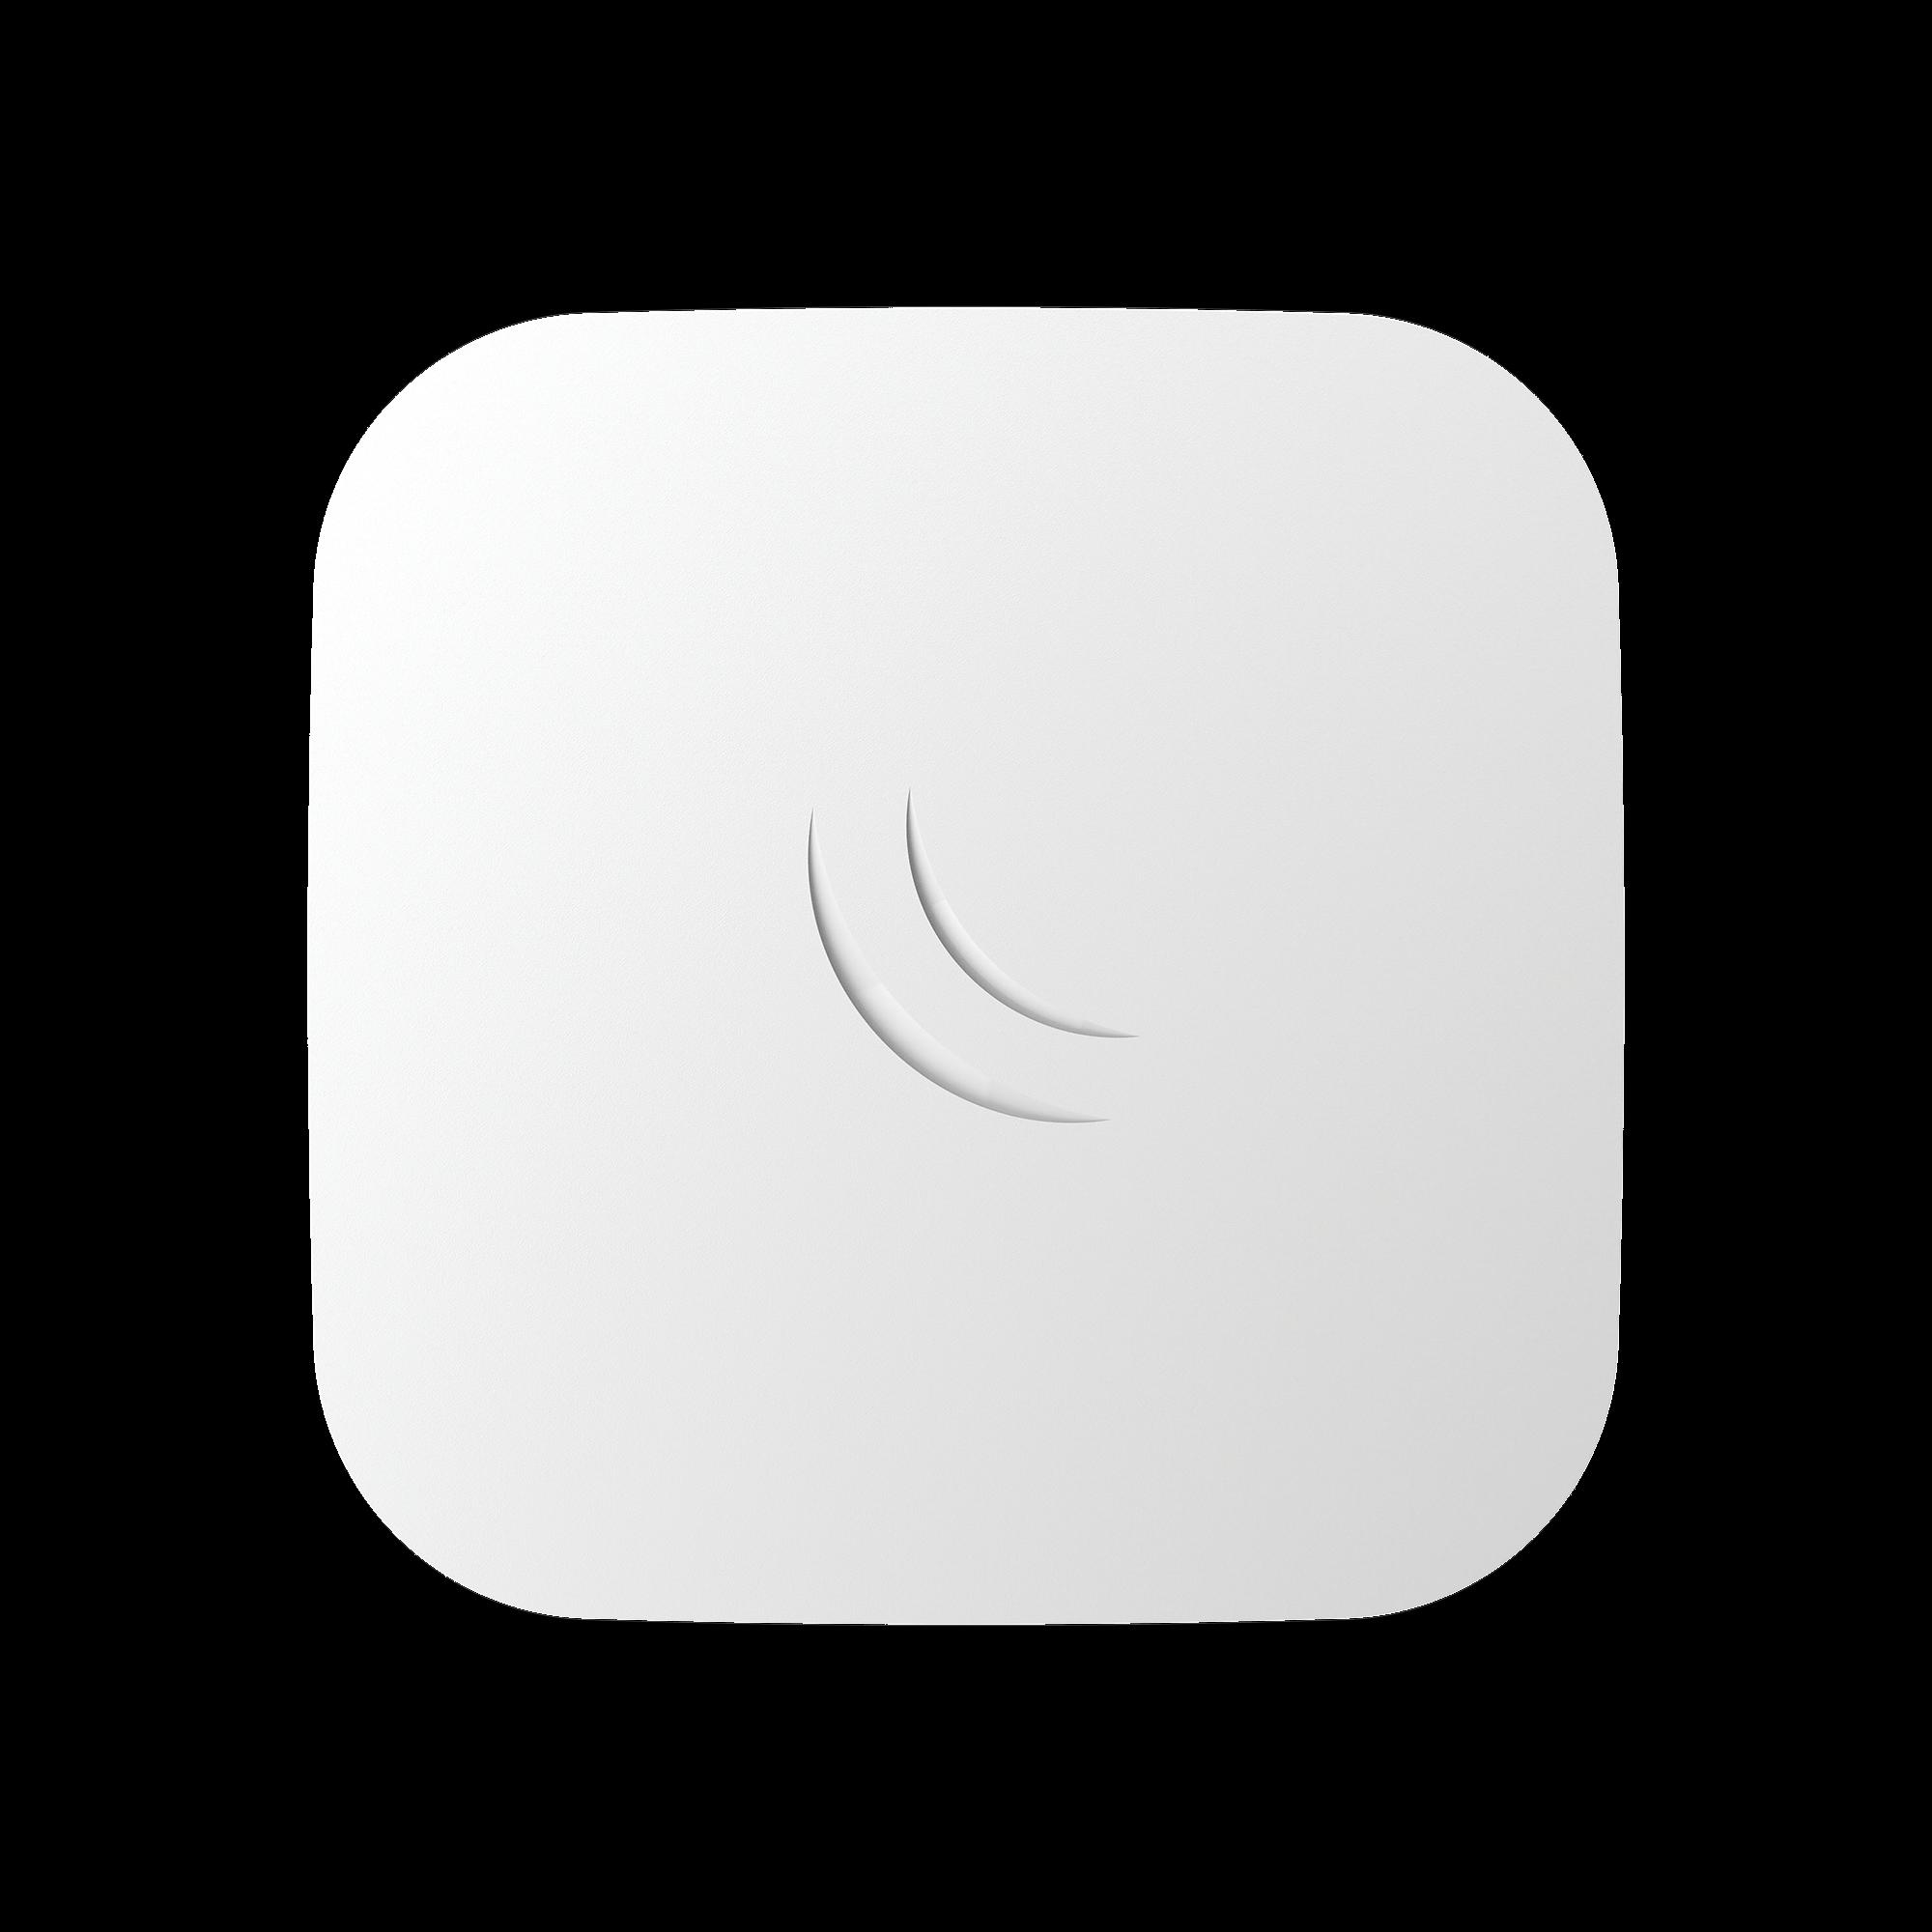 (cAP ac) Punto de Acceso / Cliente para Interior Doble banda 802.11b/g/n/ac Wave 2 hasta 400 mW